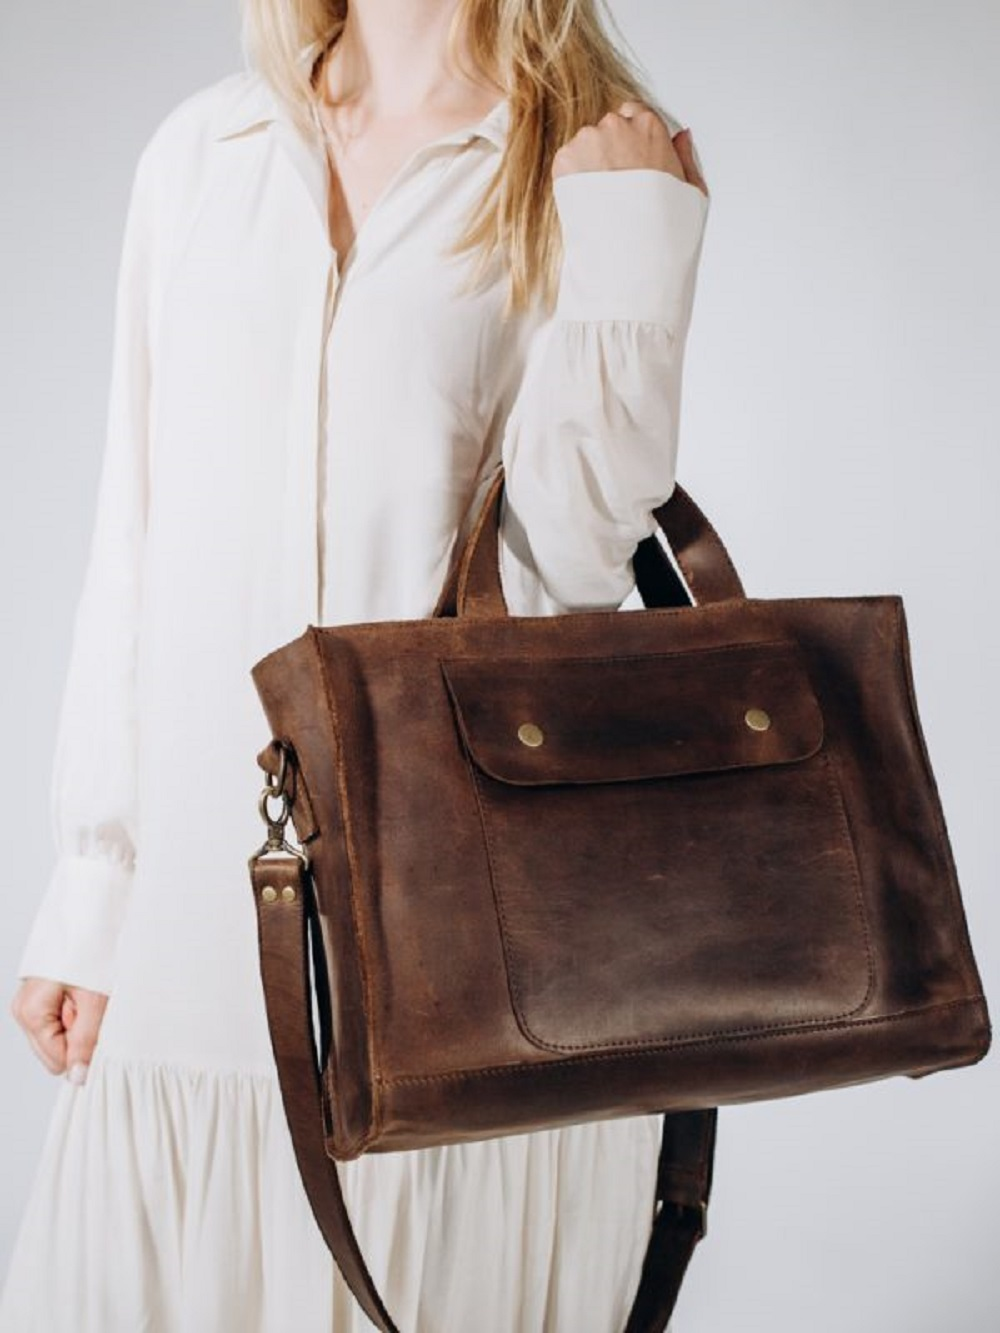 TORBA DAMSKA T03 VINTAGE BROWN - torba unisex brązowa - torba służbowa - torba elegancka - Lezerton